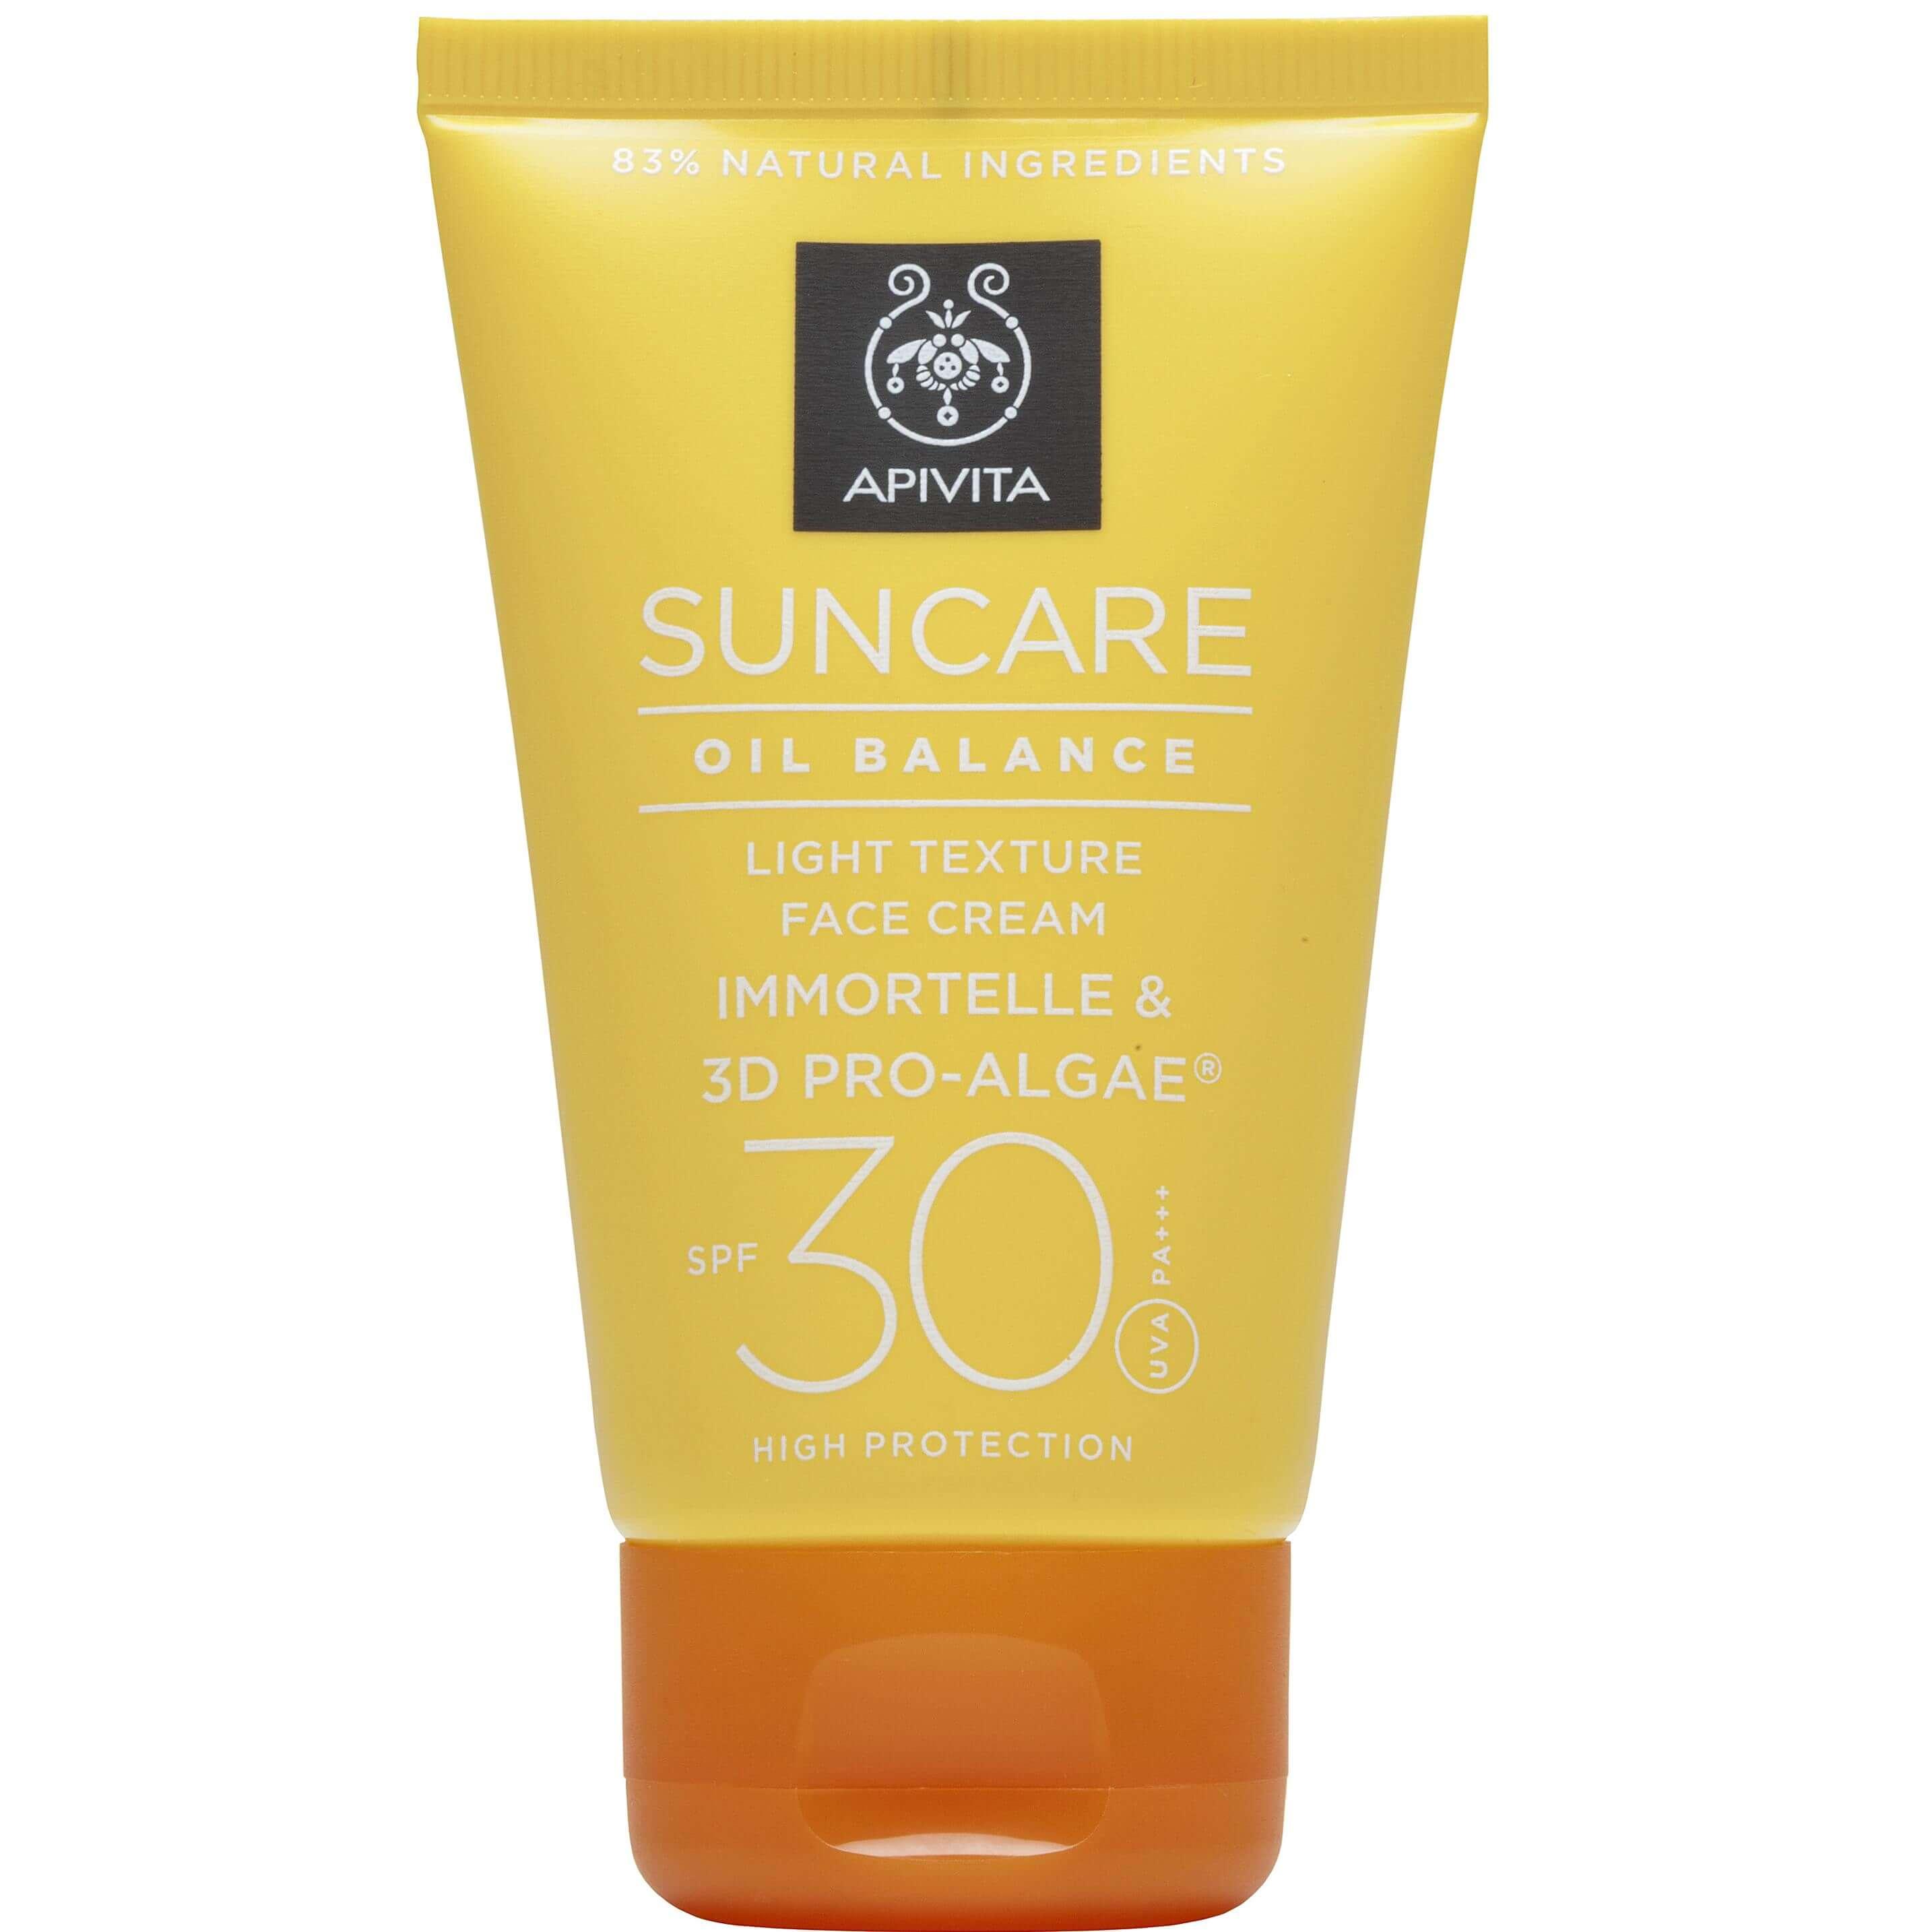 Apivita Suncare Oil Balance Light Texture Face Cream Αντηλιακή Κρέμα Προσώπου Spf30 με Eλίχρυσο & 3D PRO-ALGAE® 50ml